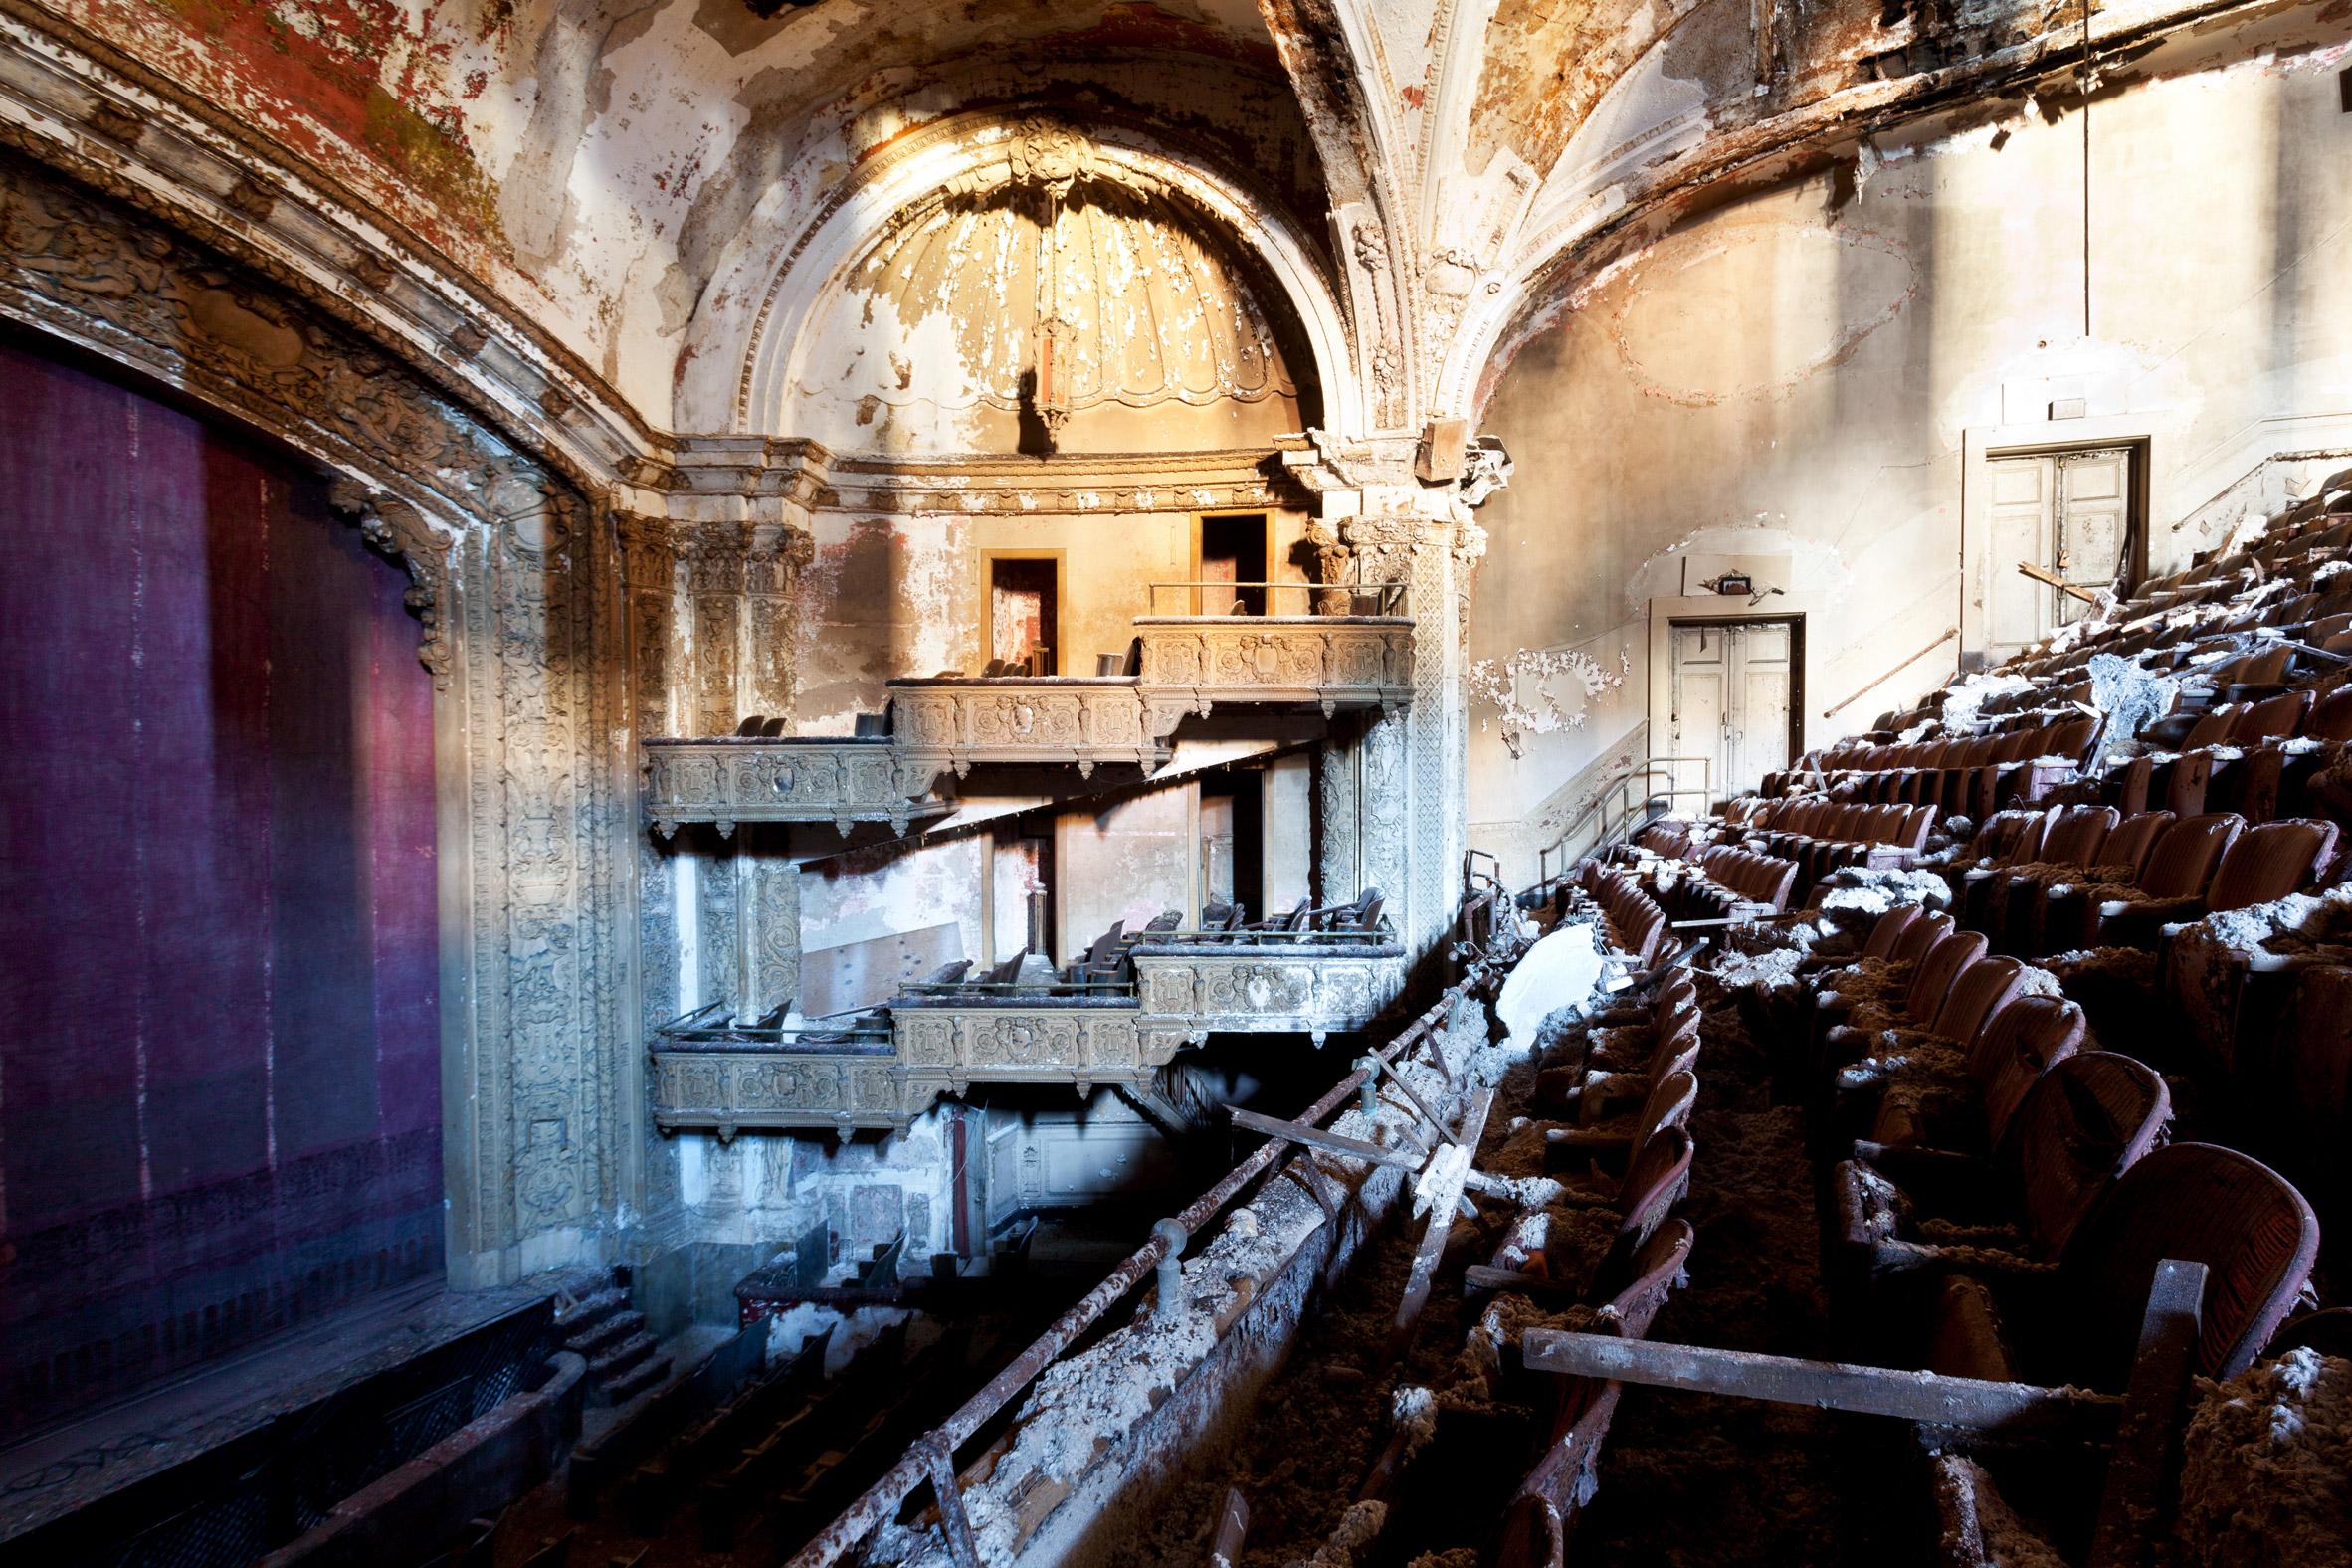 Matt Lambros' After the Final Curtain photographs show America's forgotten movie theatres